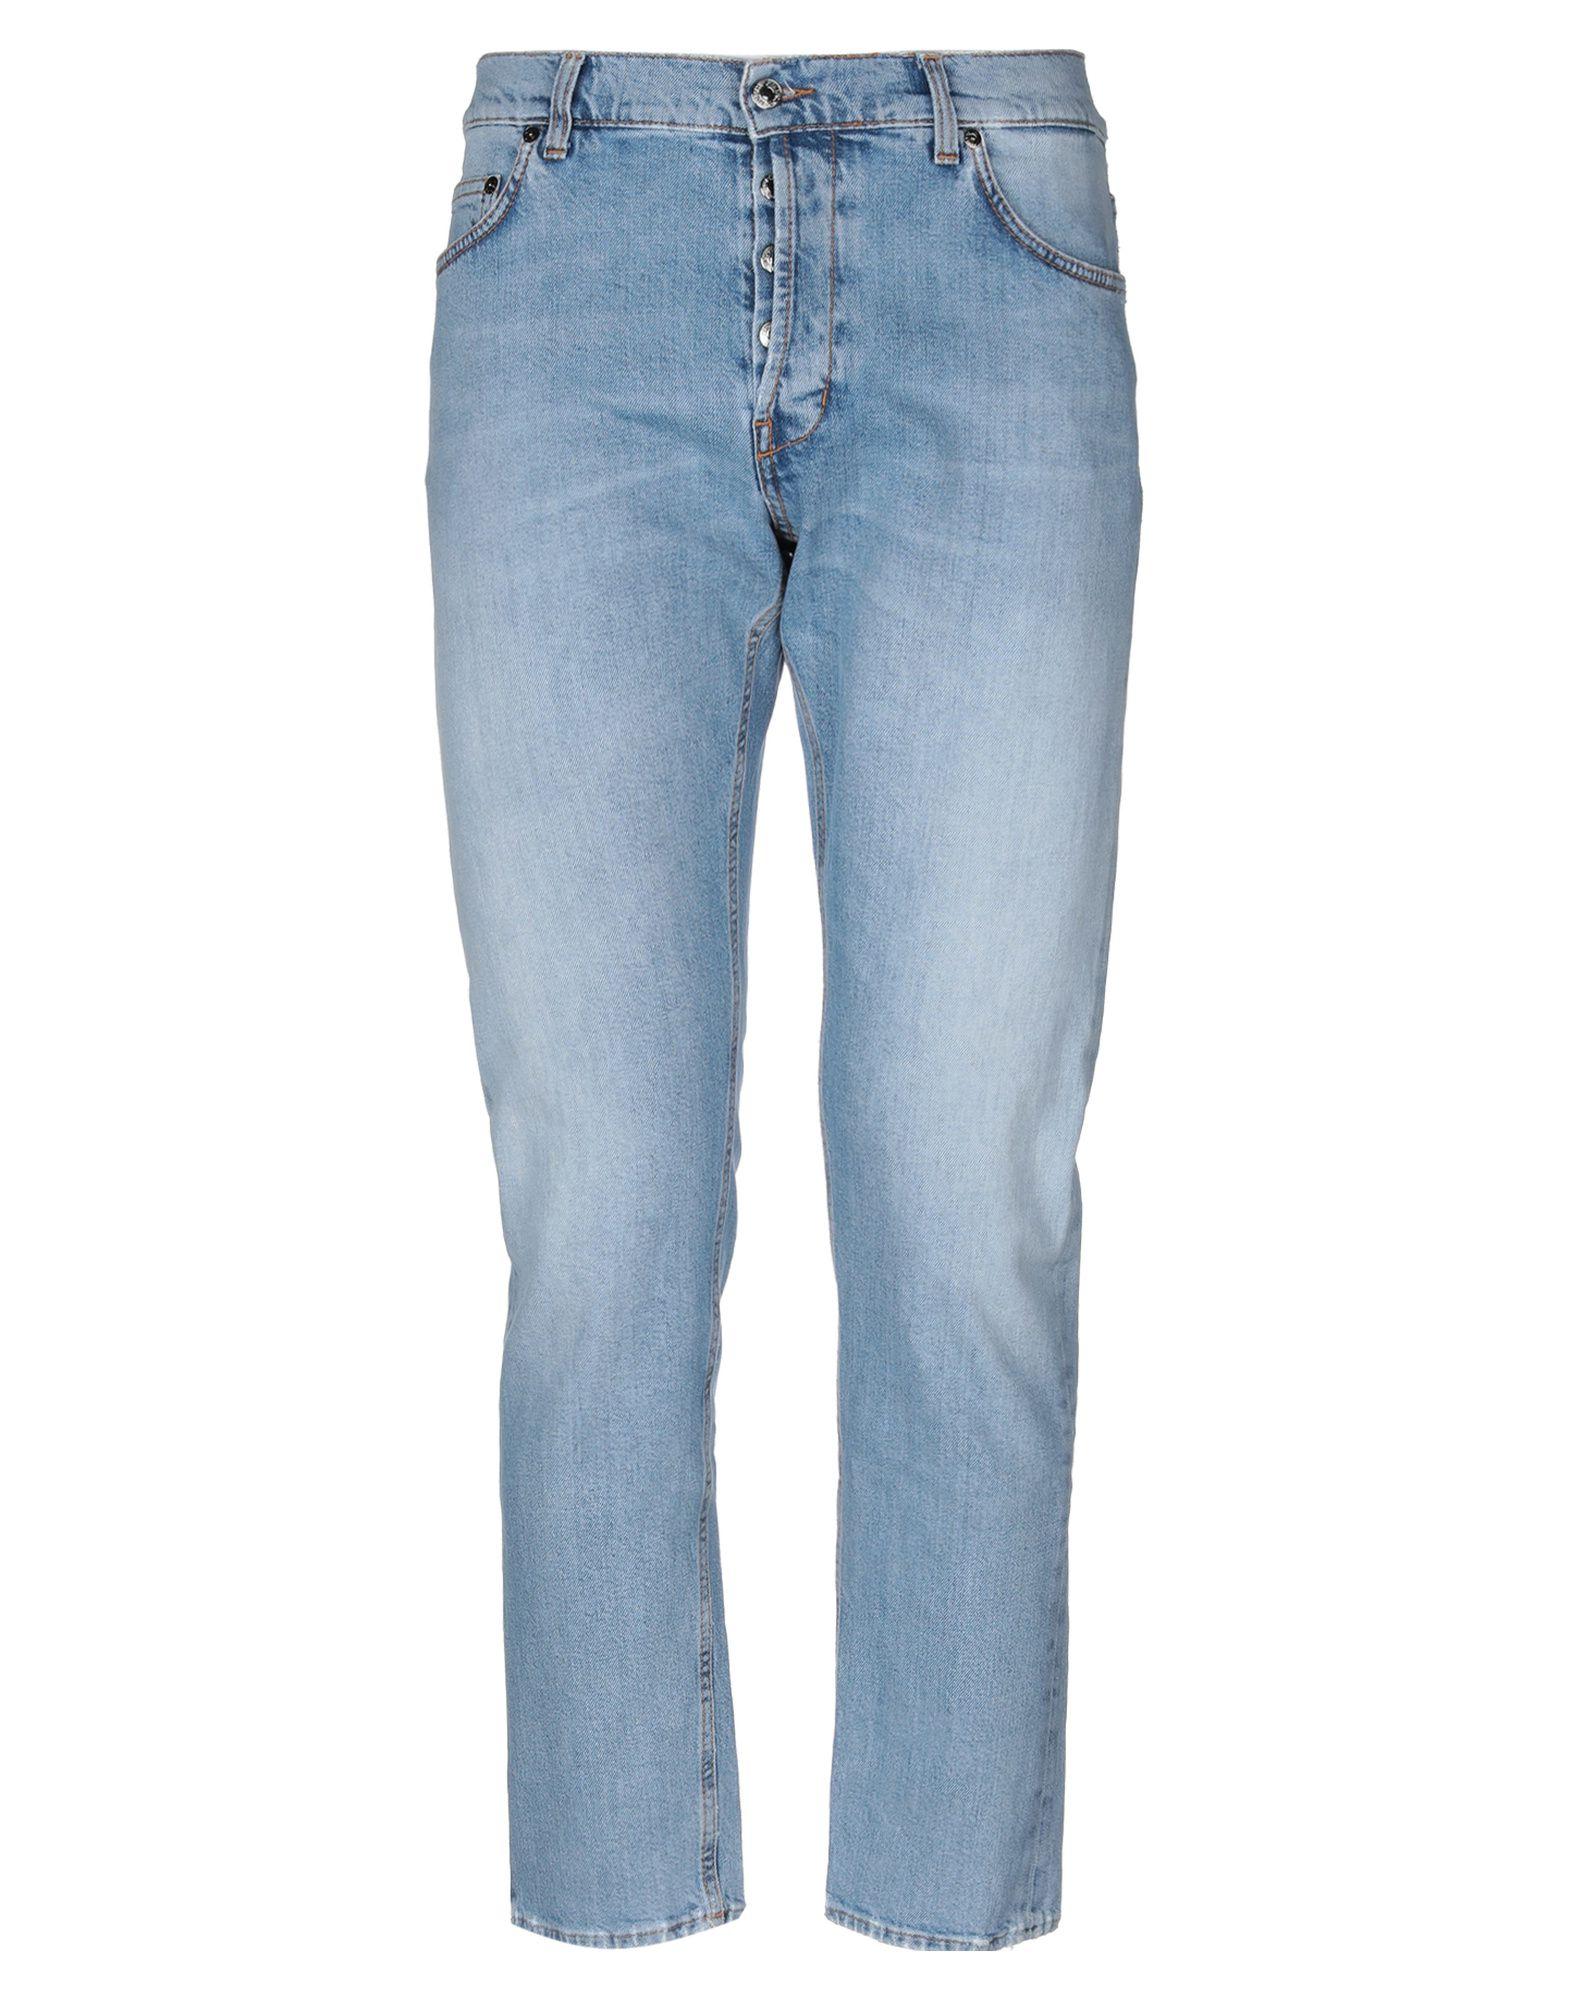 Pantaloni Jeans Aglini uomo uomo uomo - 42741976EK a8f